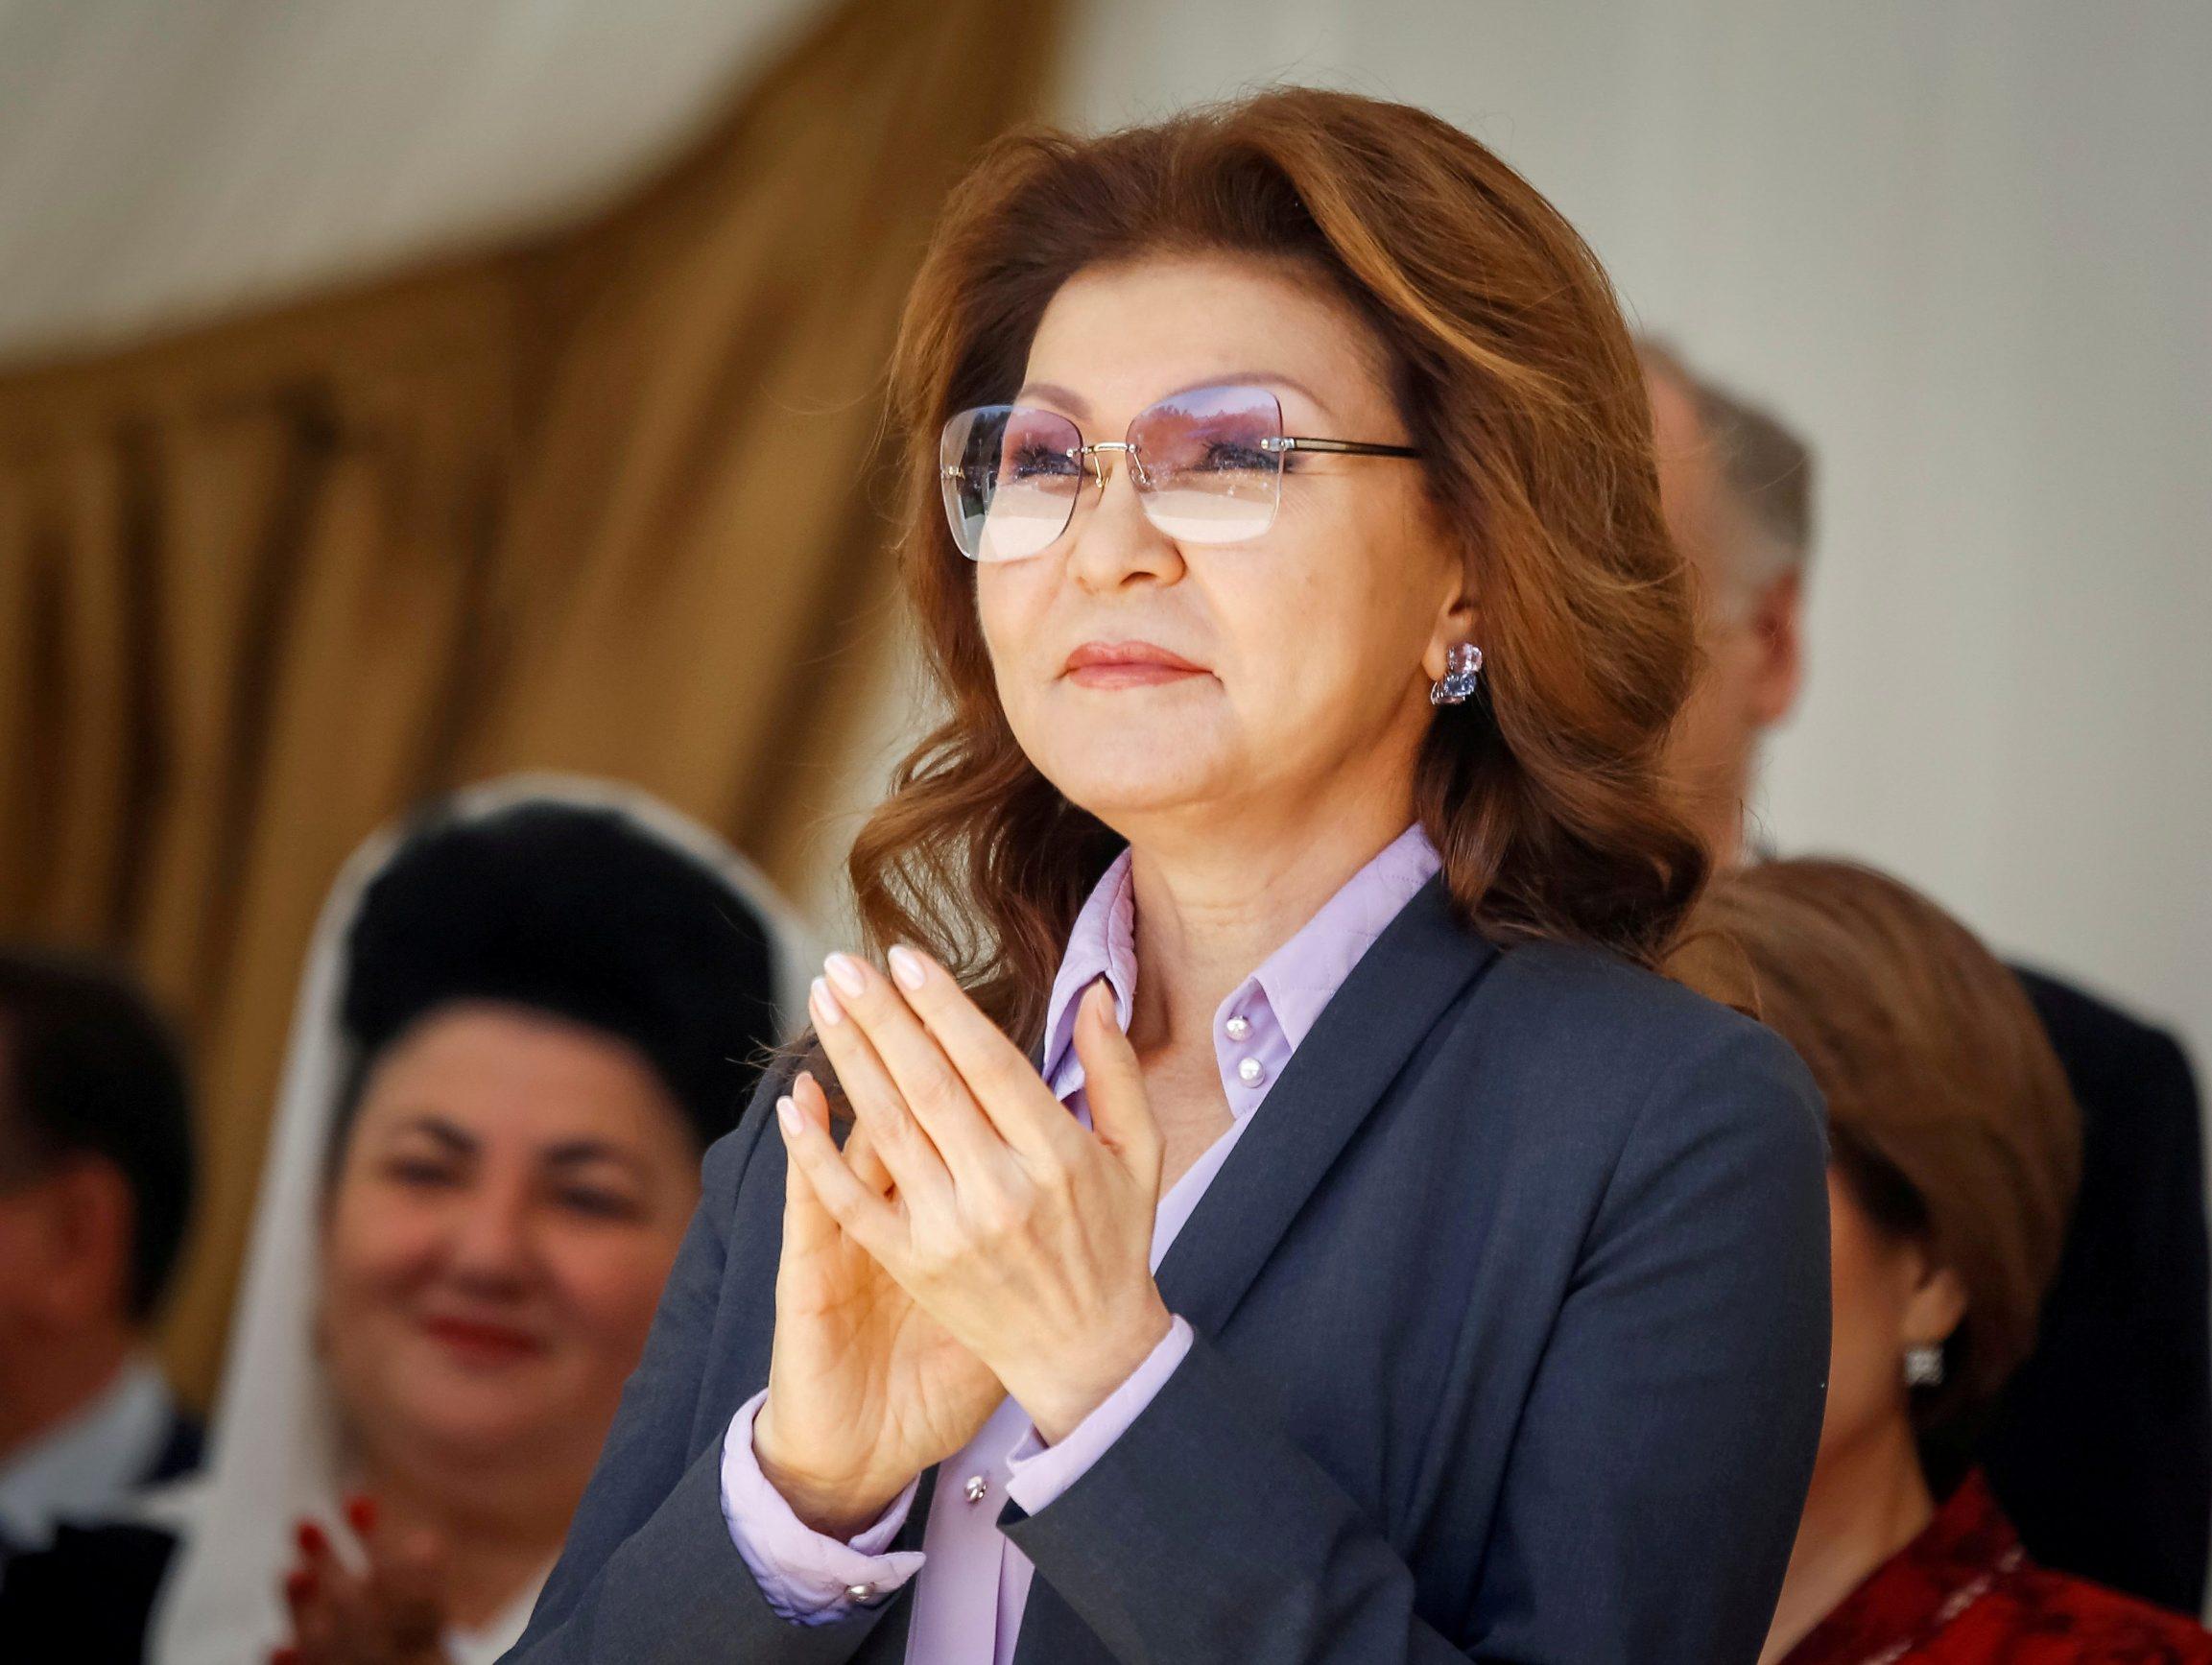 FILE PHOTO: Dariga Nazarbayeva, daughter of Kazakhstan's President Nursultan Nazarbayev and the country's Deputy Prime Minister, attends celebrations to mark Kazakhstan People's Unity Day in Almaty, Kazakhstan May 1, 2016. REUTERS/Shamil Zhumatov/File Photo